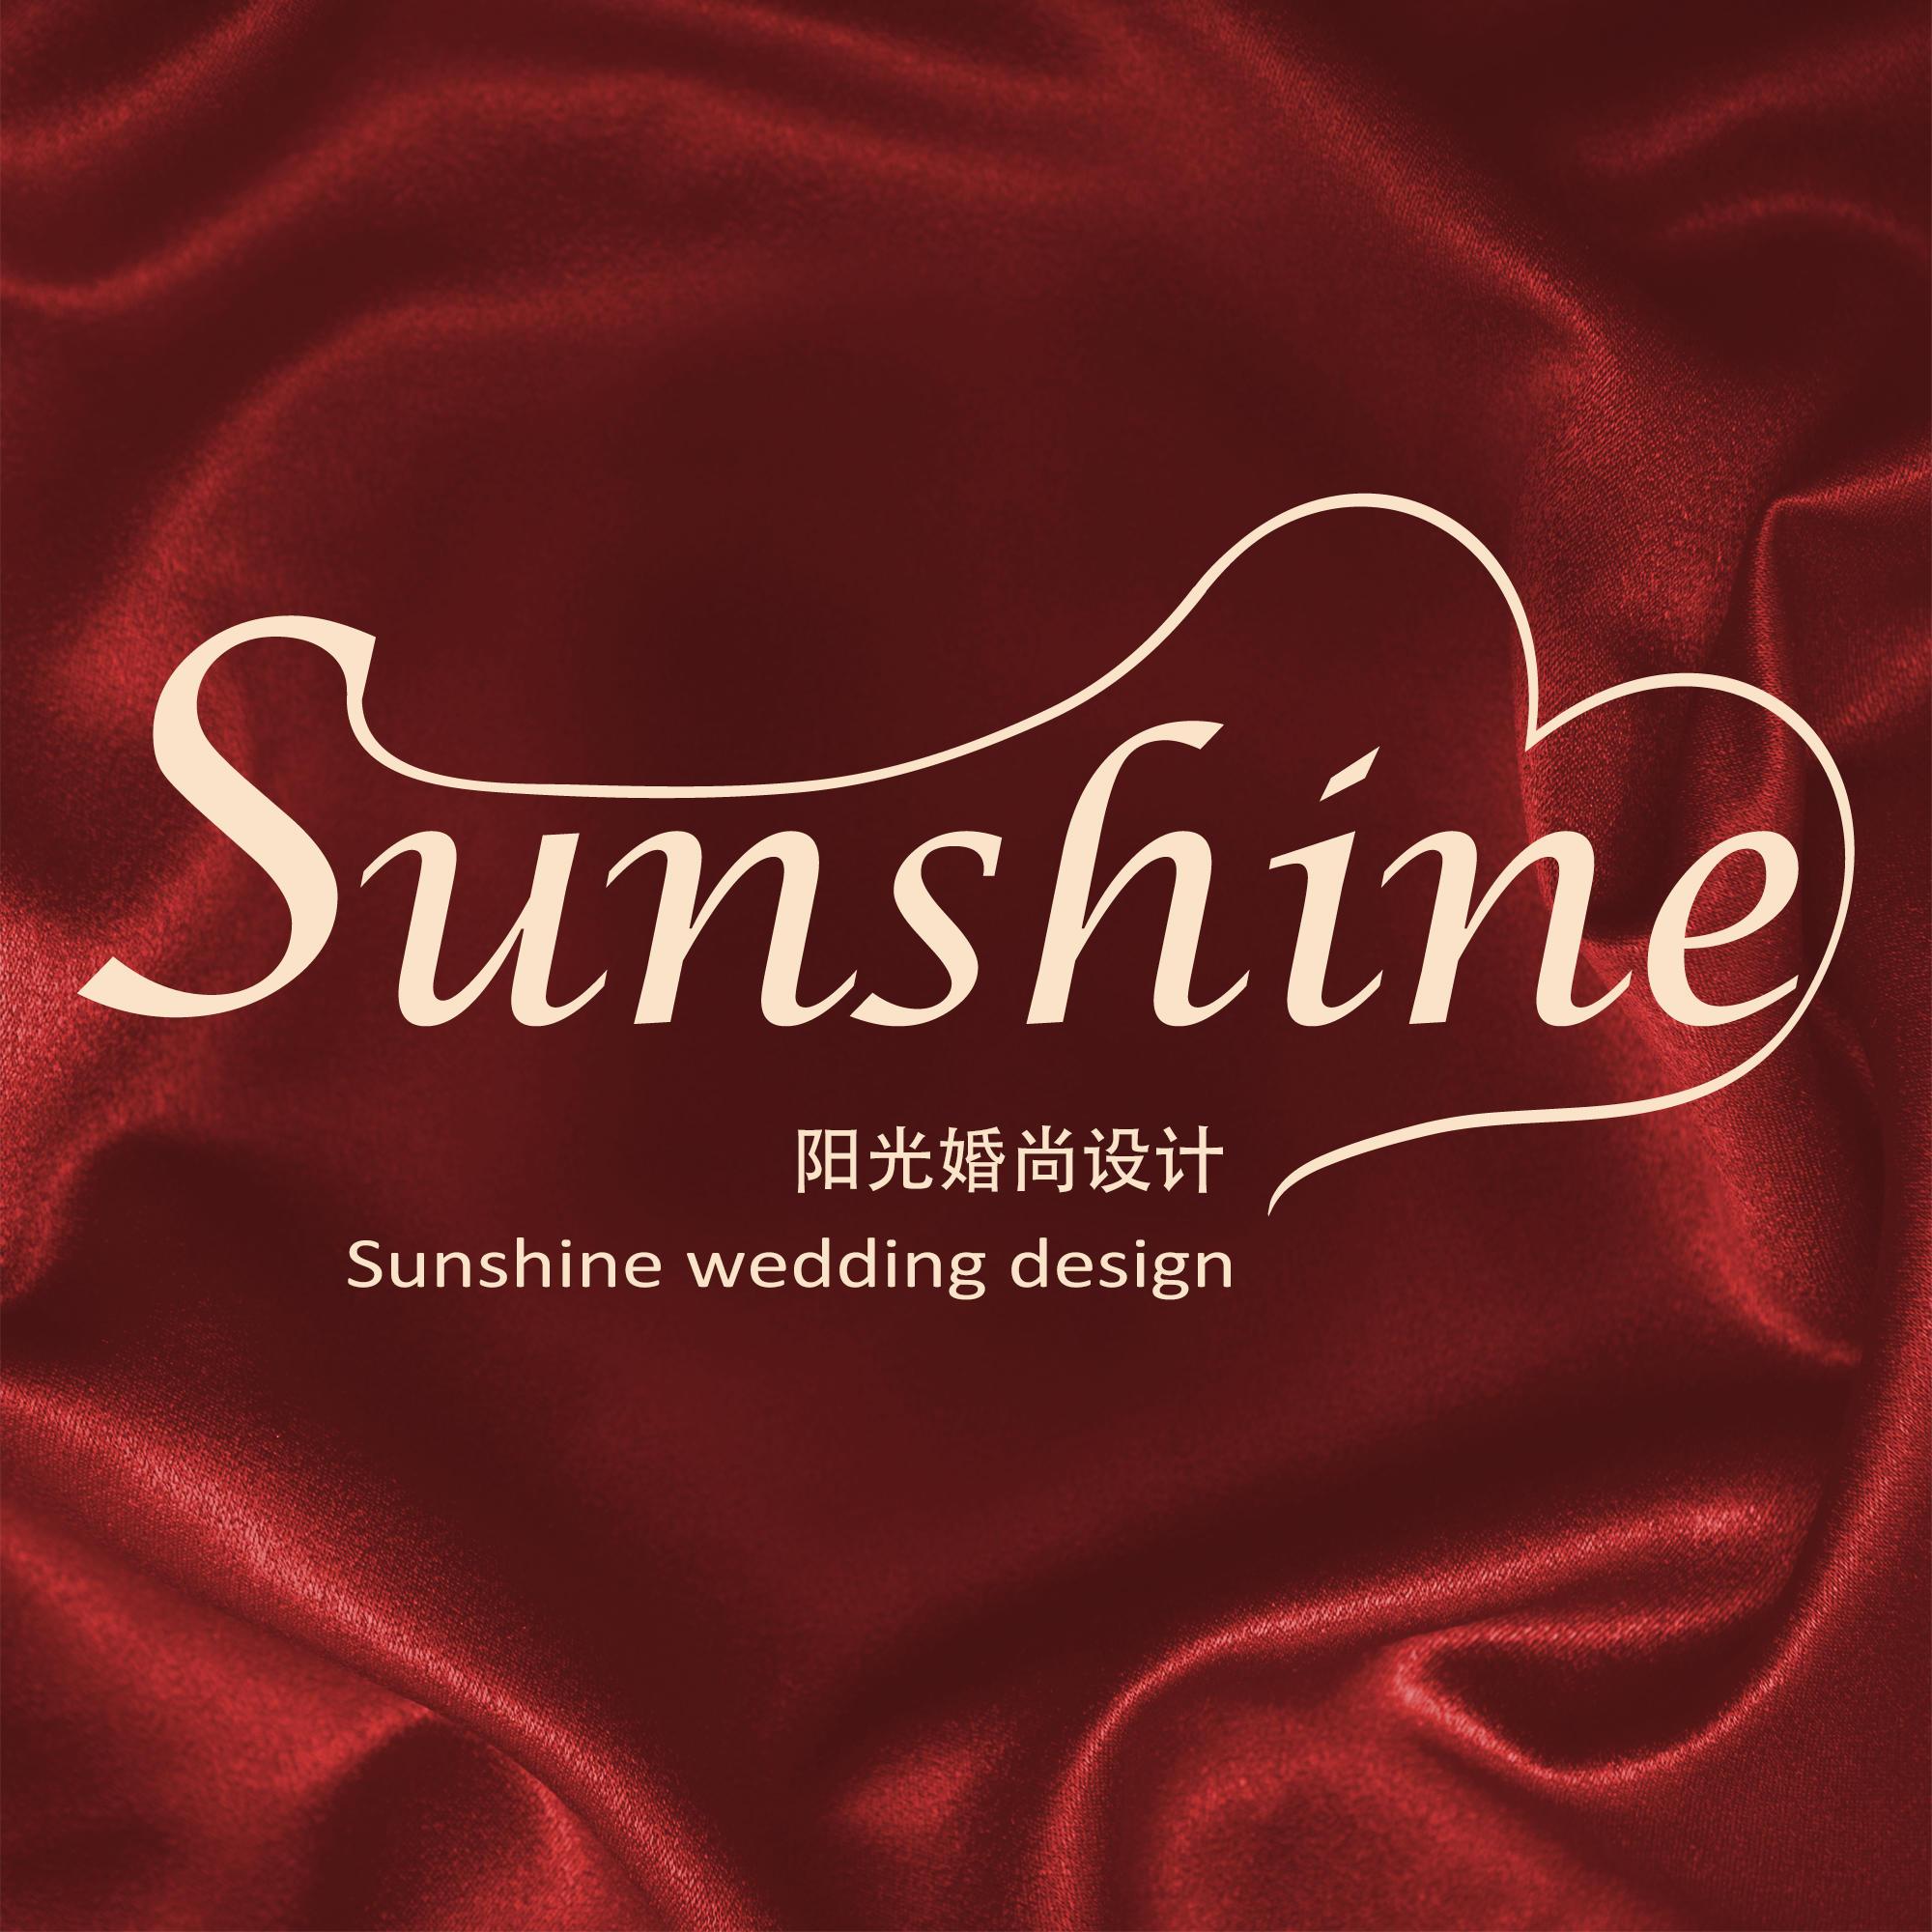 Sunshine婚尚设计